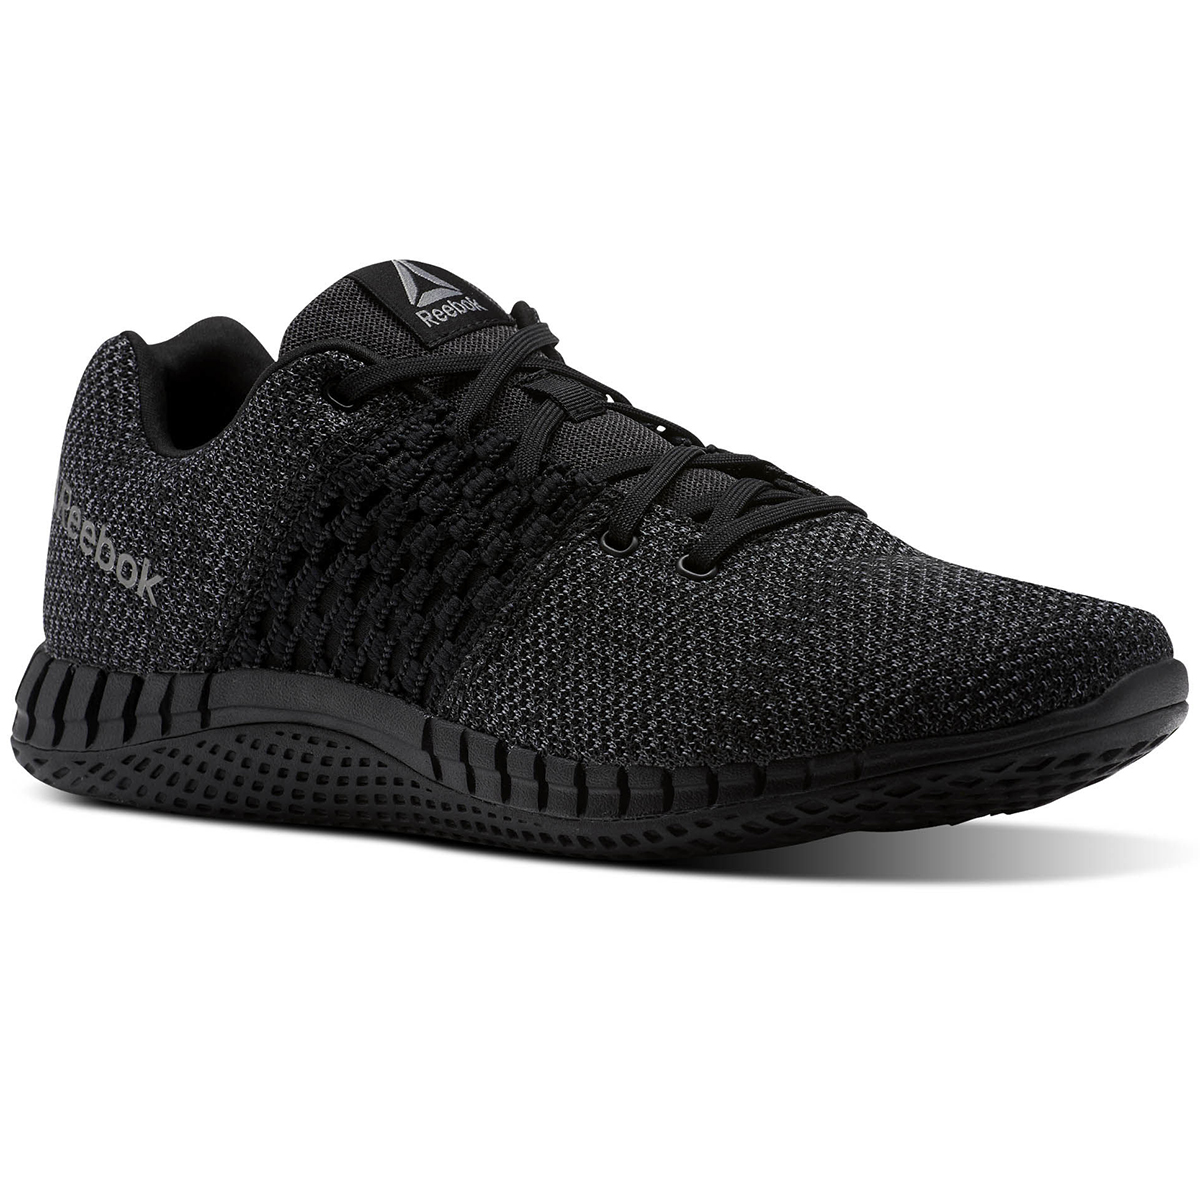 Print Run ULTK Running Shoes